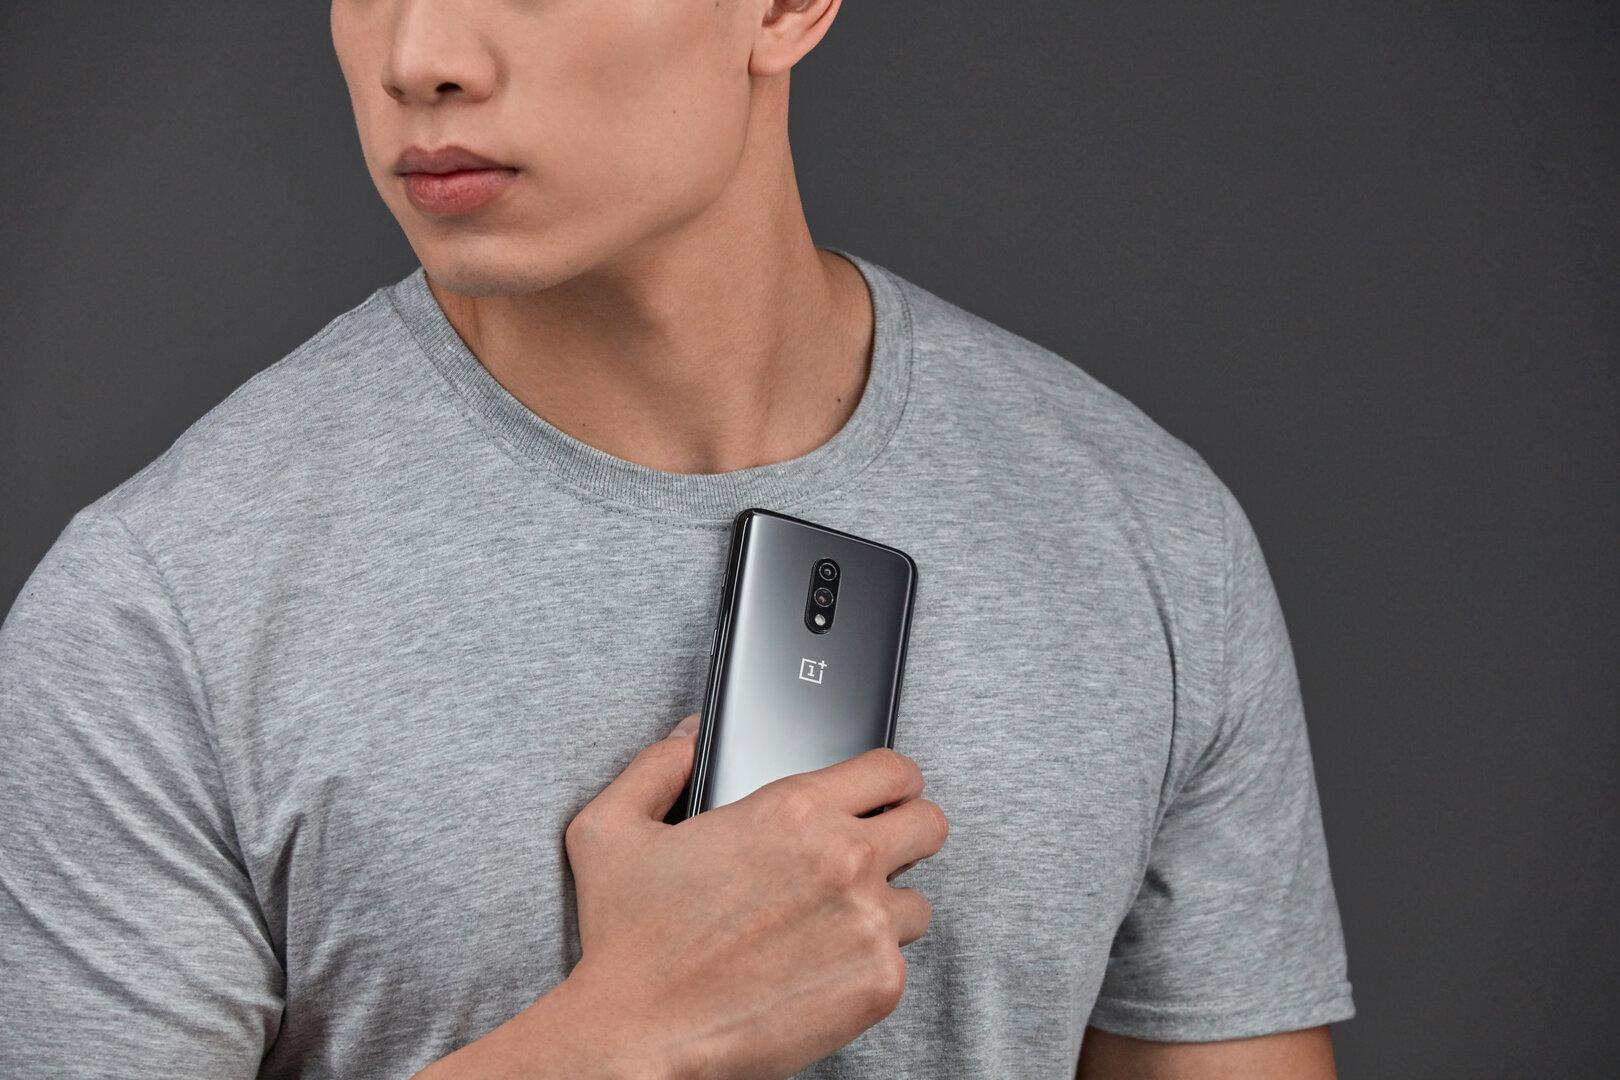 OnePlus 7 Pro in Mirror Gray